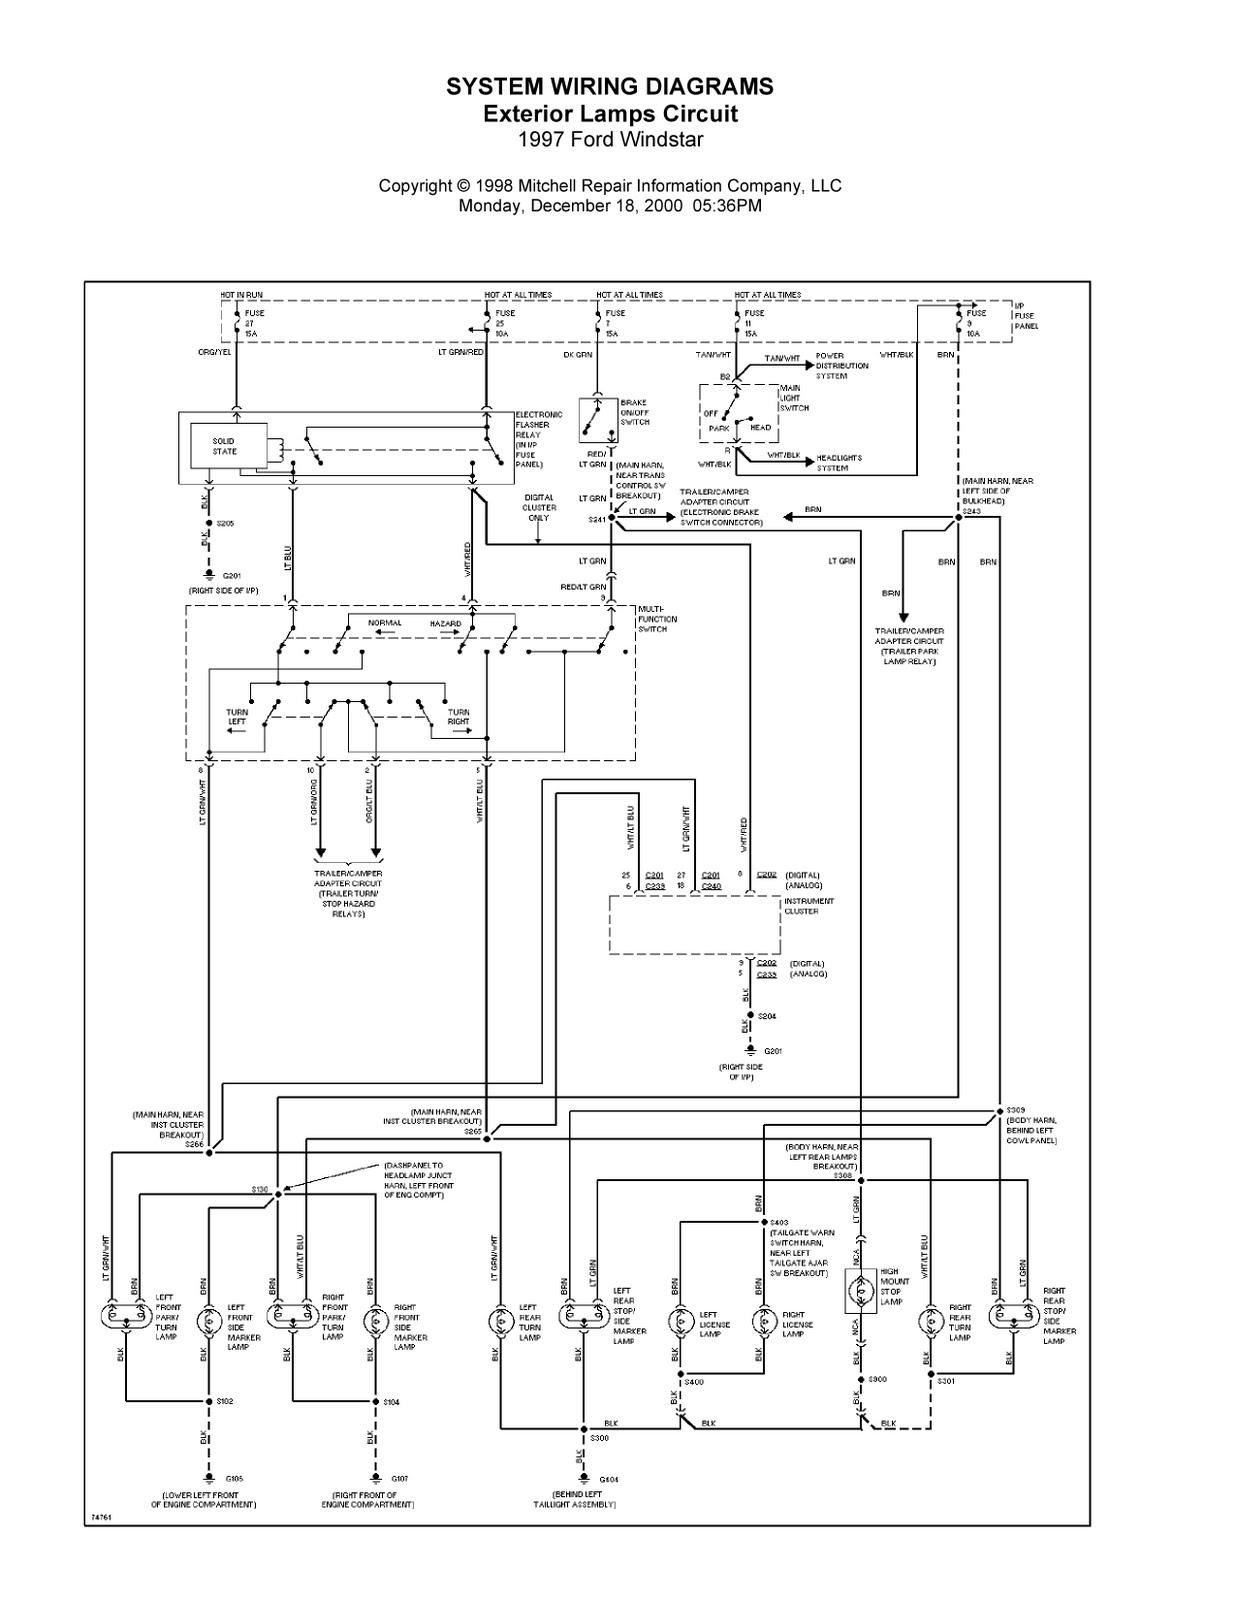 94 windstar wiring diagram